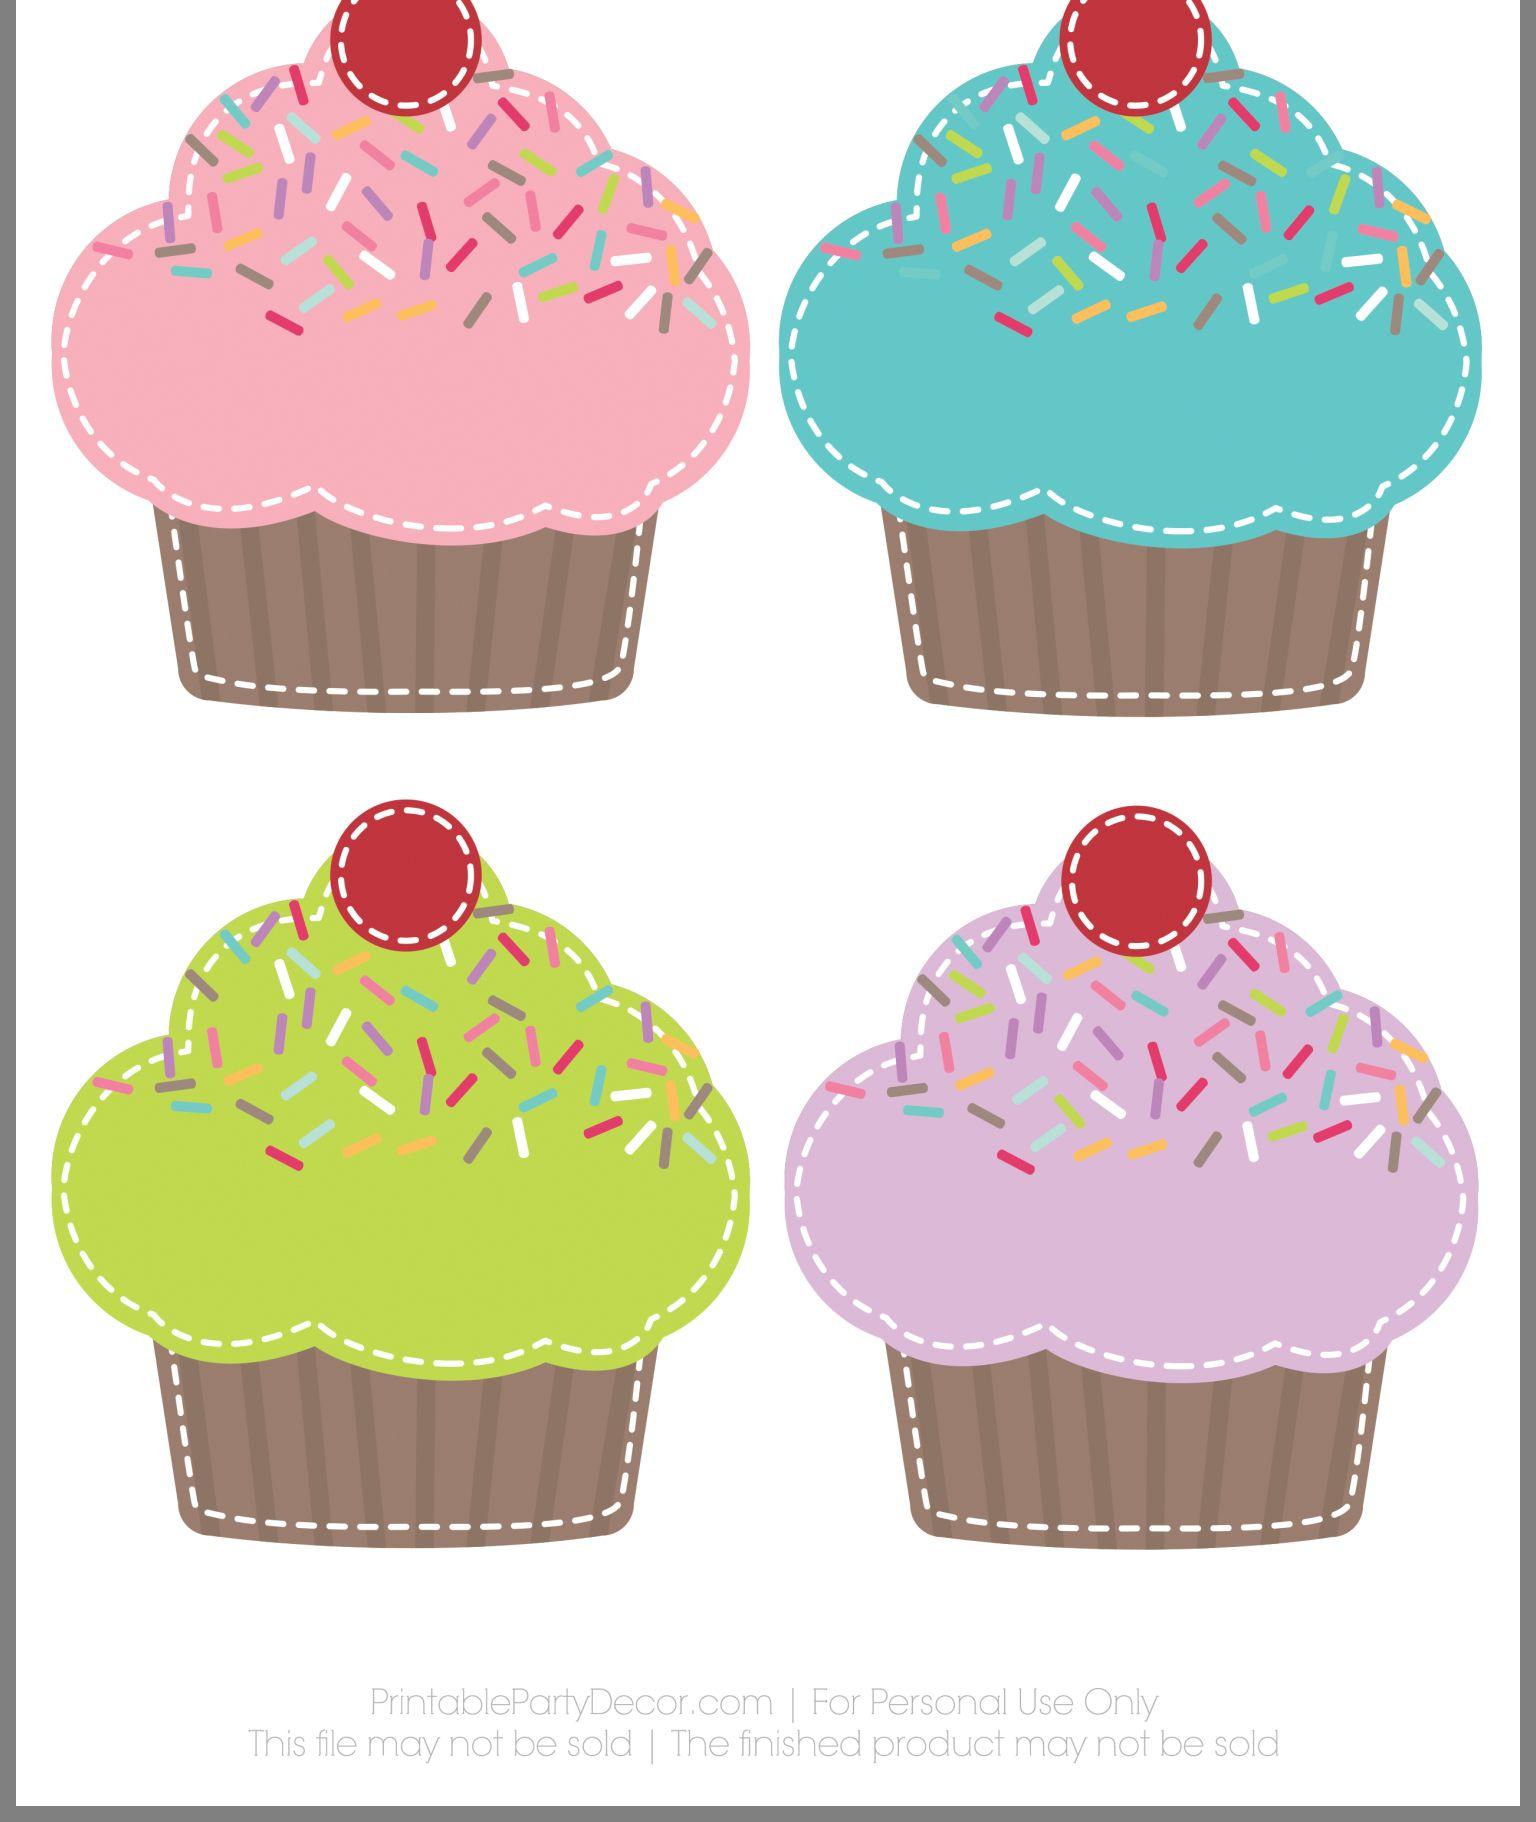 Birthday Cupcake Template  Yatay.horizonconsulting.co with Free Printable Cupcake Birthday Chart